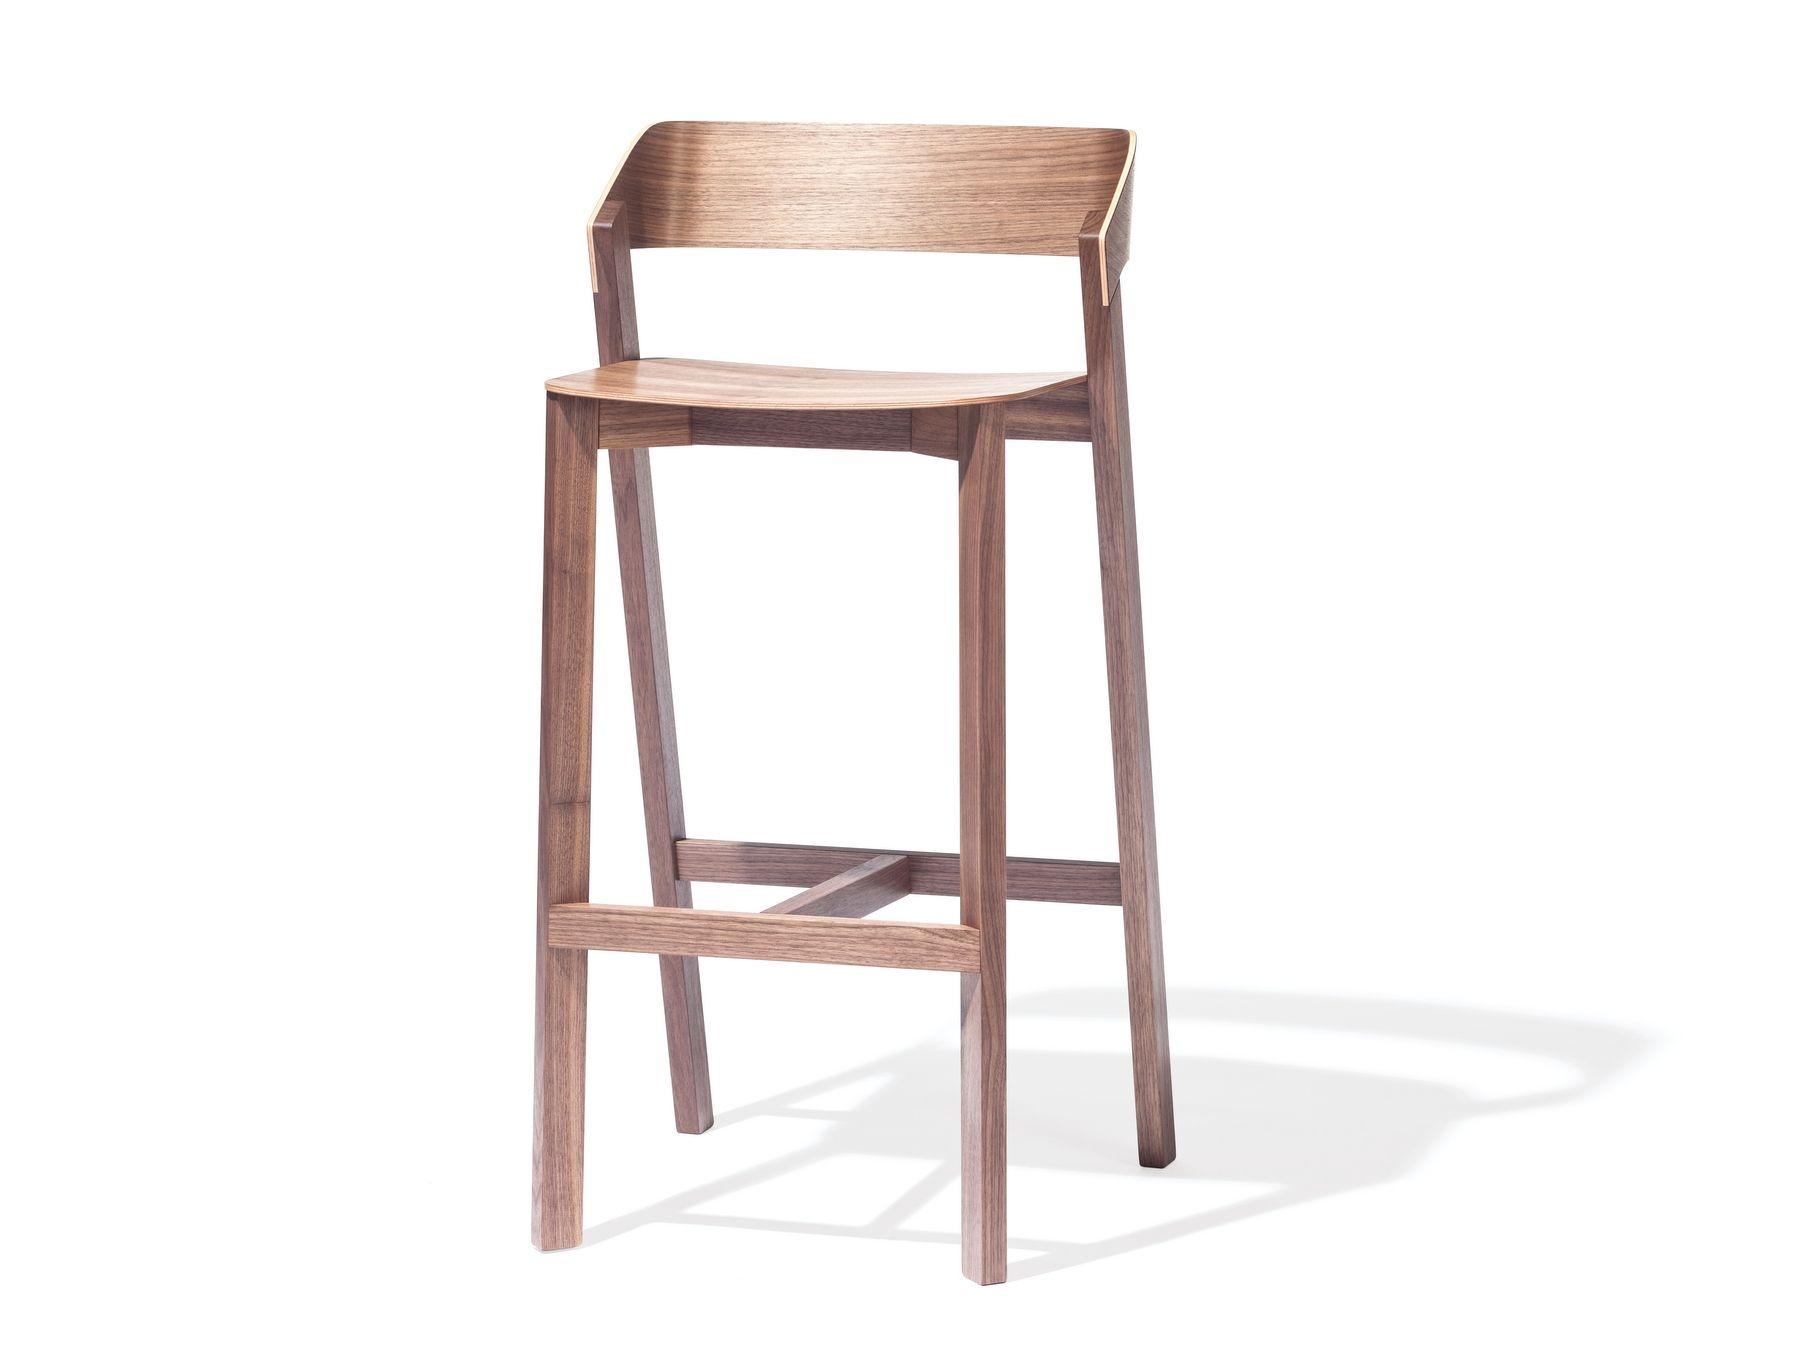 Merano sgabello alto in 2018 wanna see pics of my stools